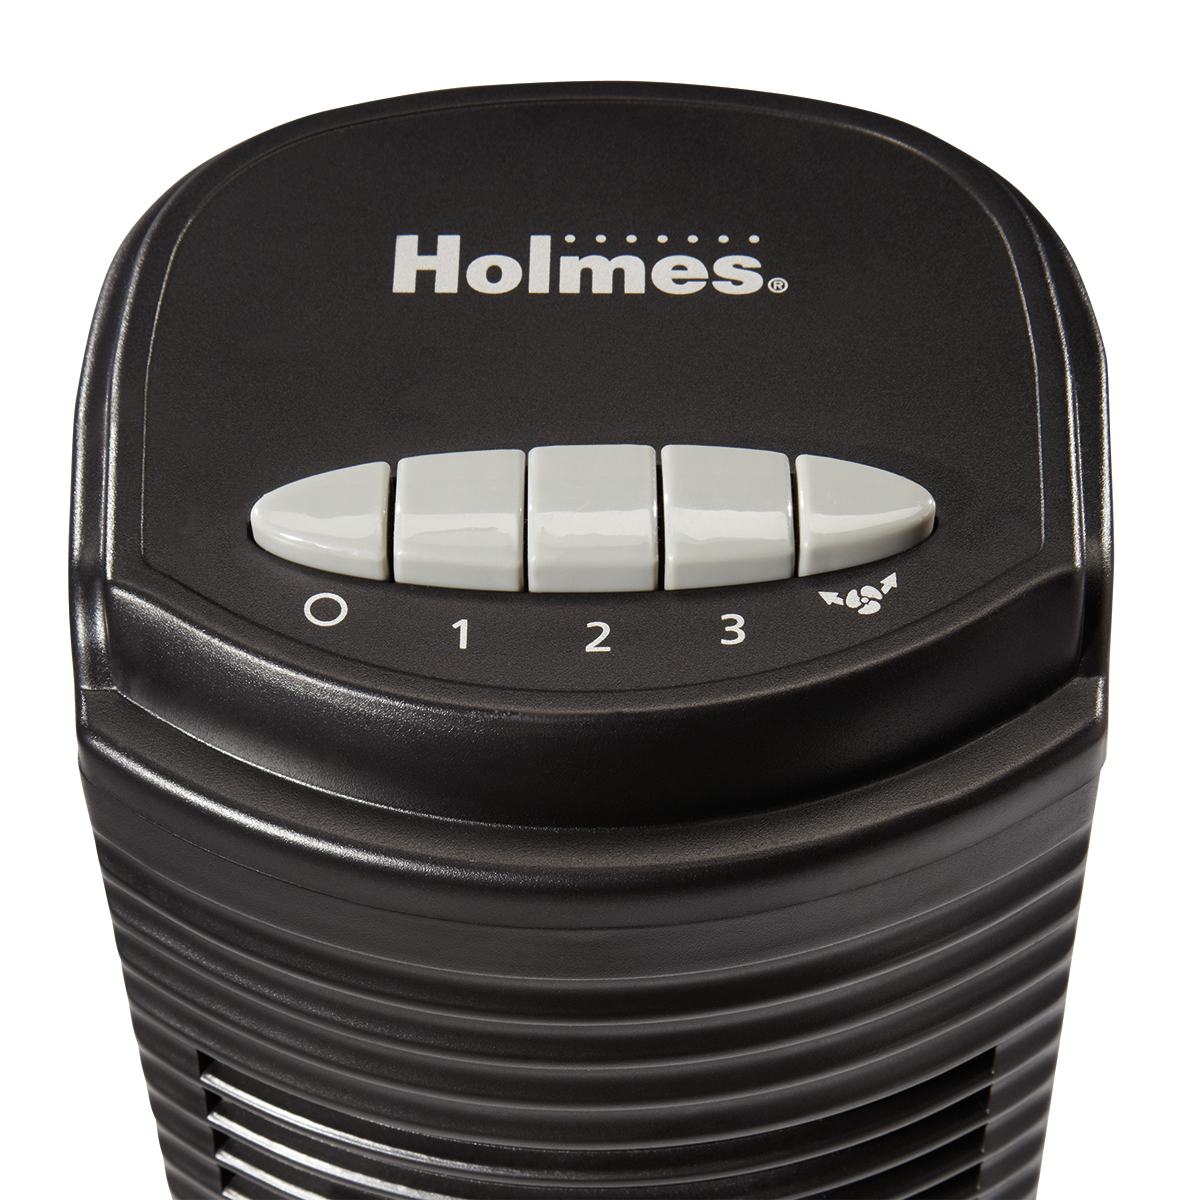 "Holmes HTF3110A-BTM Tower Fan, 31"", Black at Sears.com"